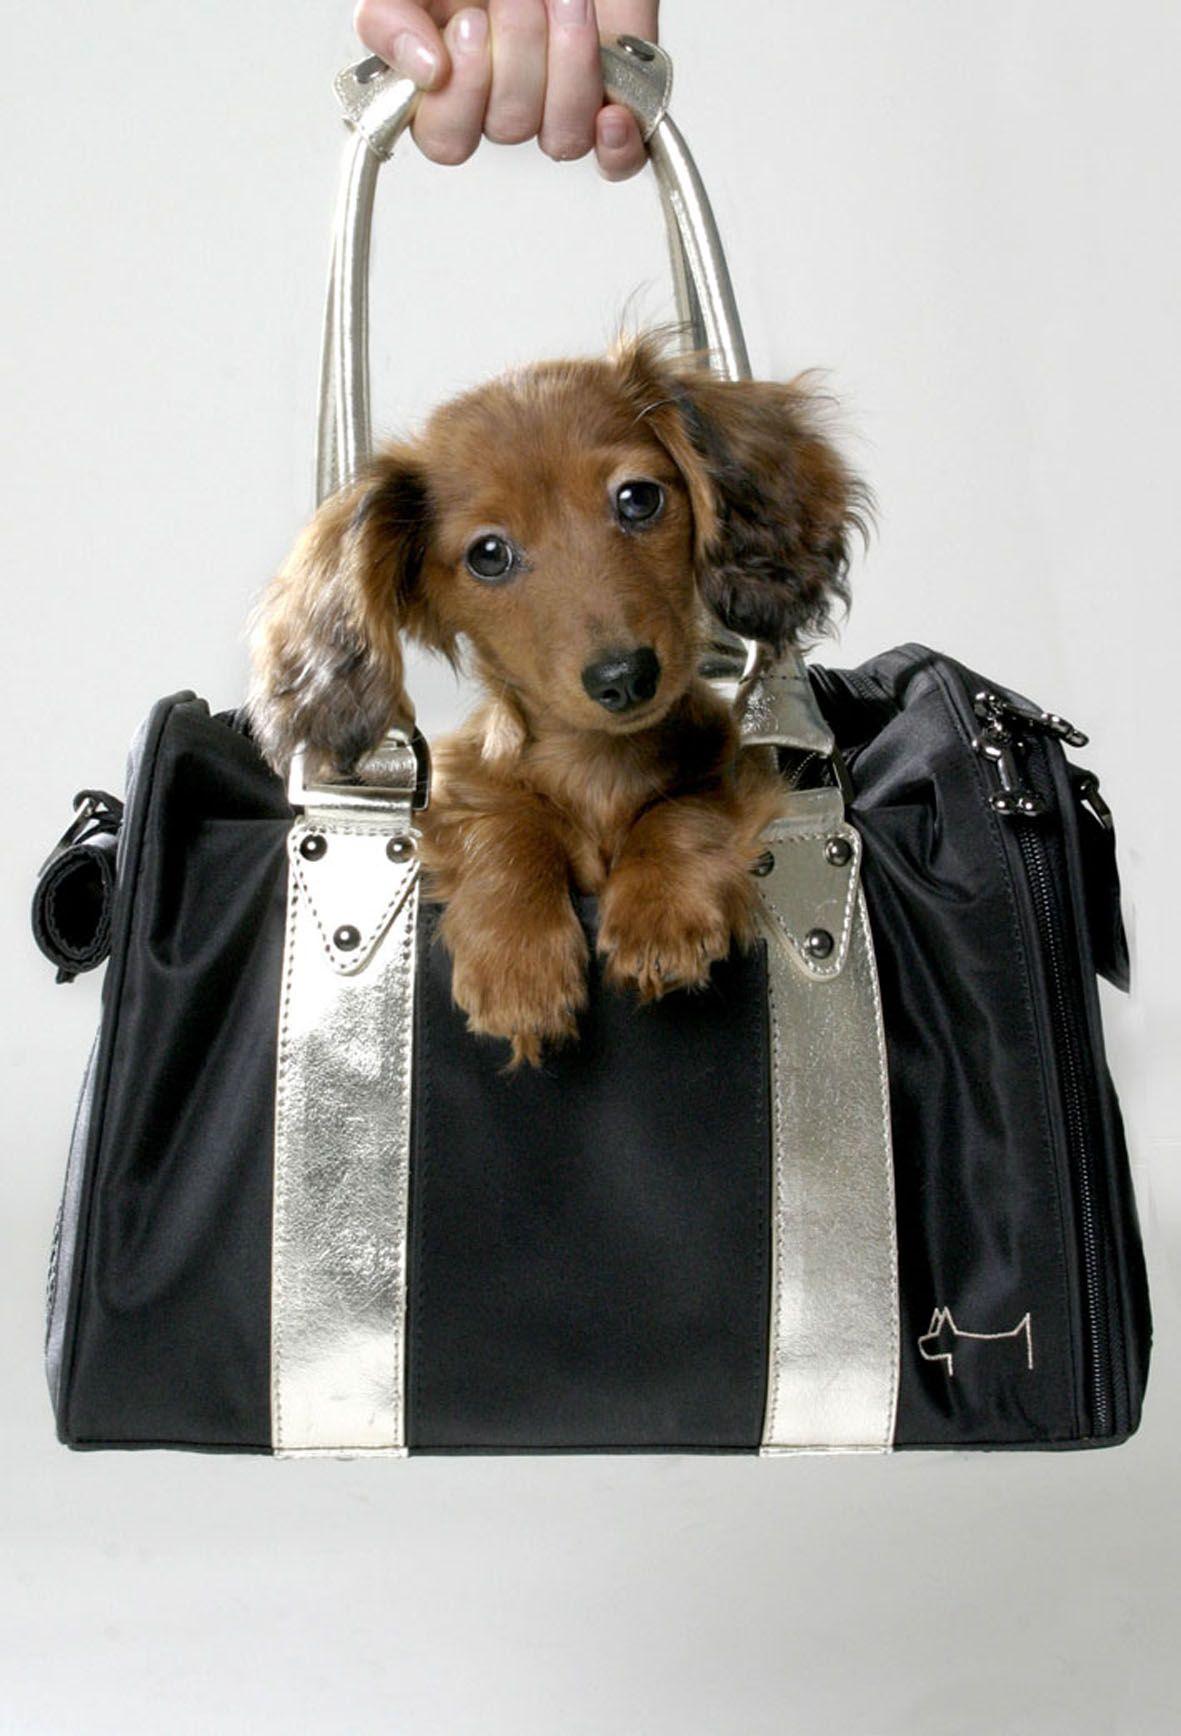 Dogs Department Dubai Bag Bags Pet Ownership Dogs